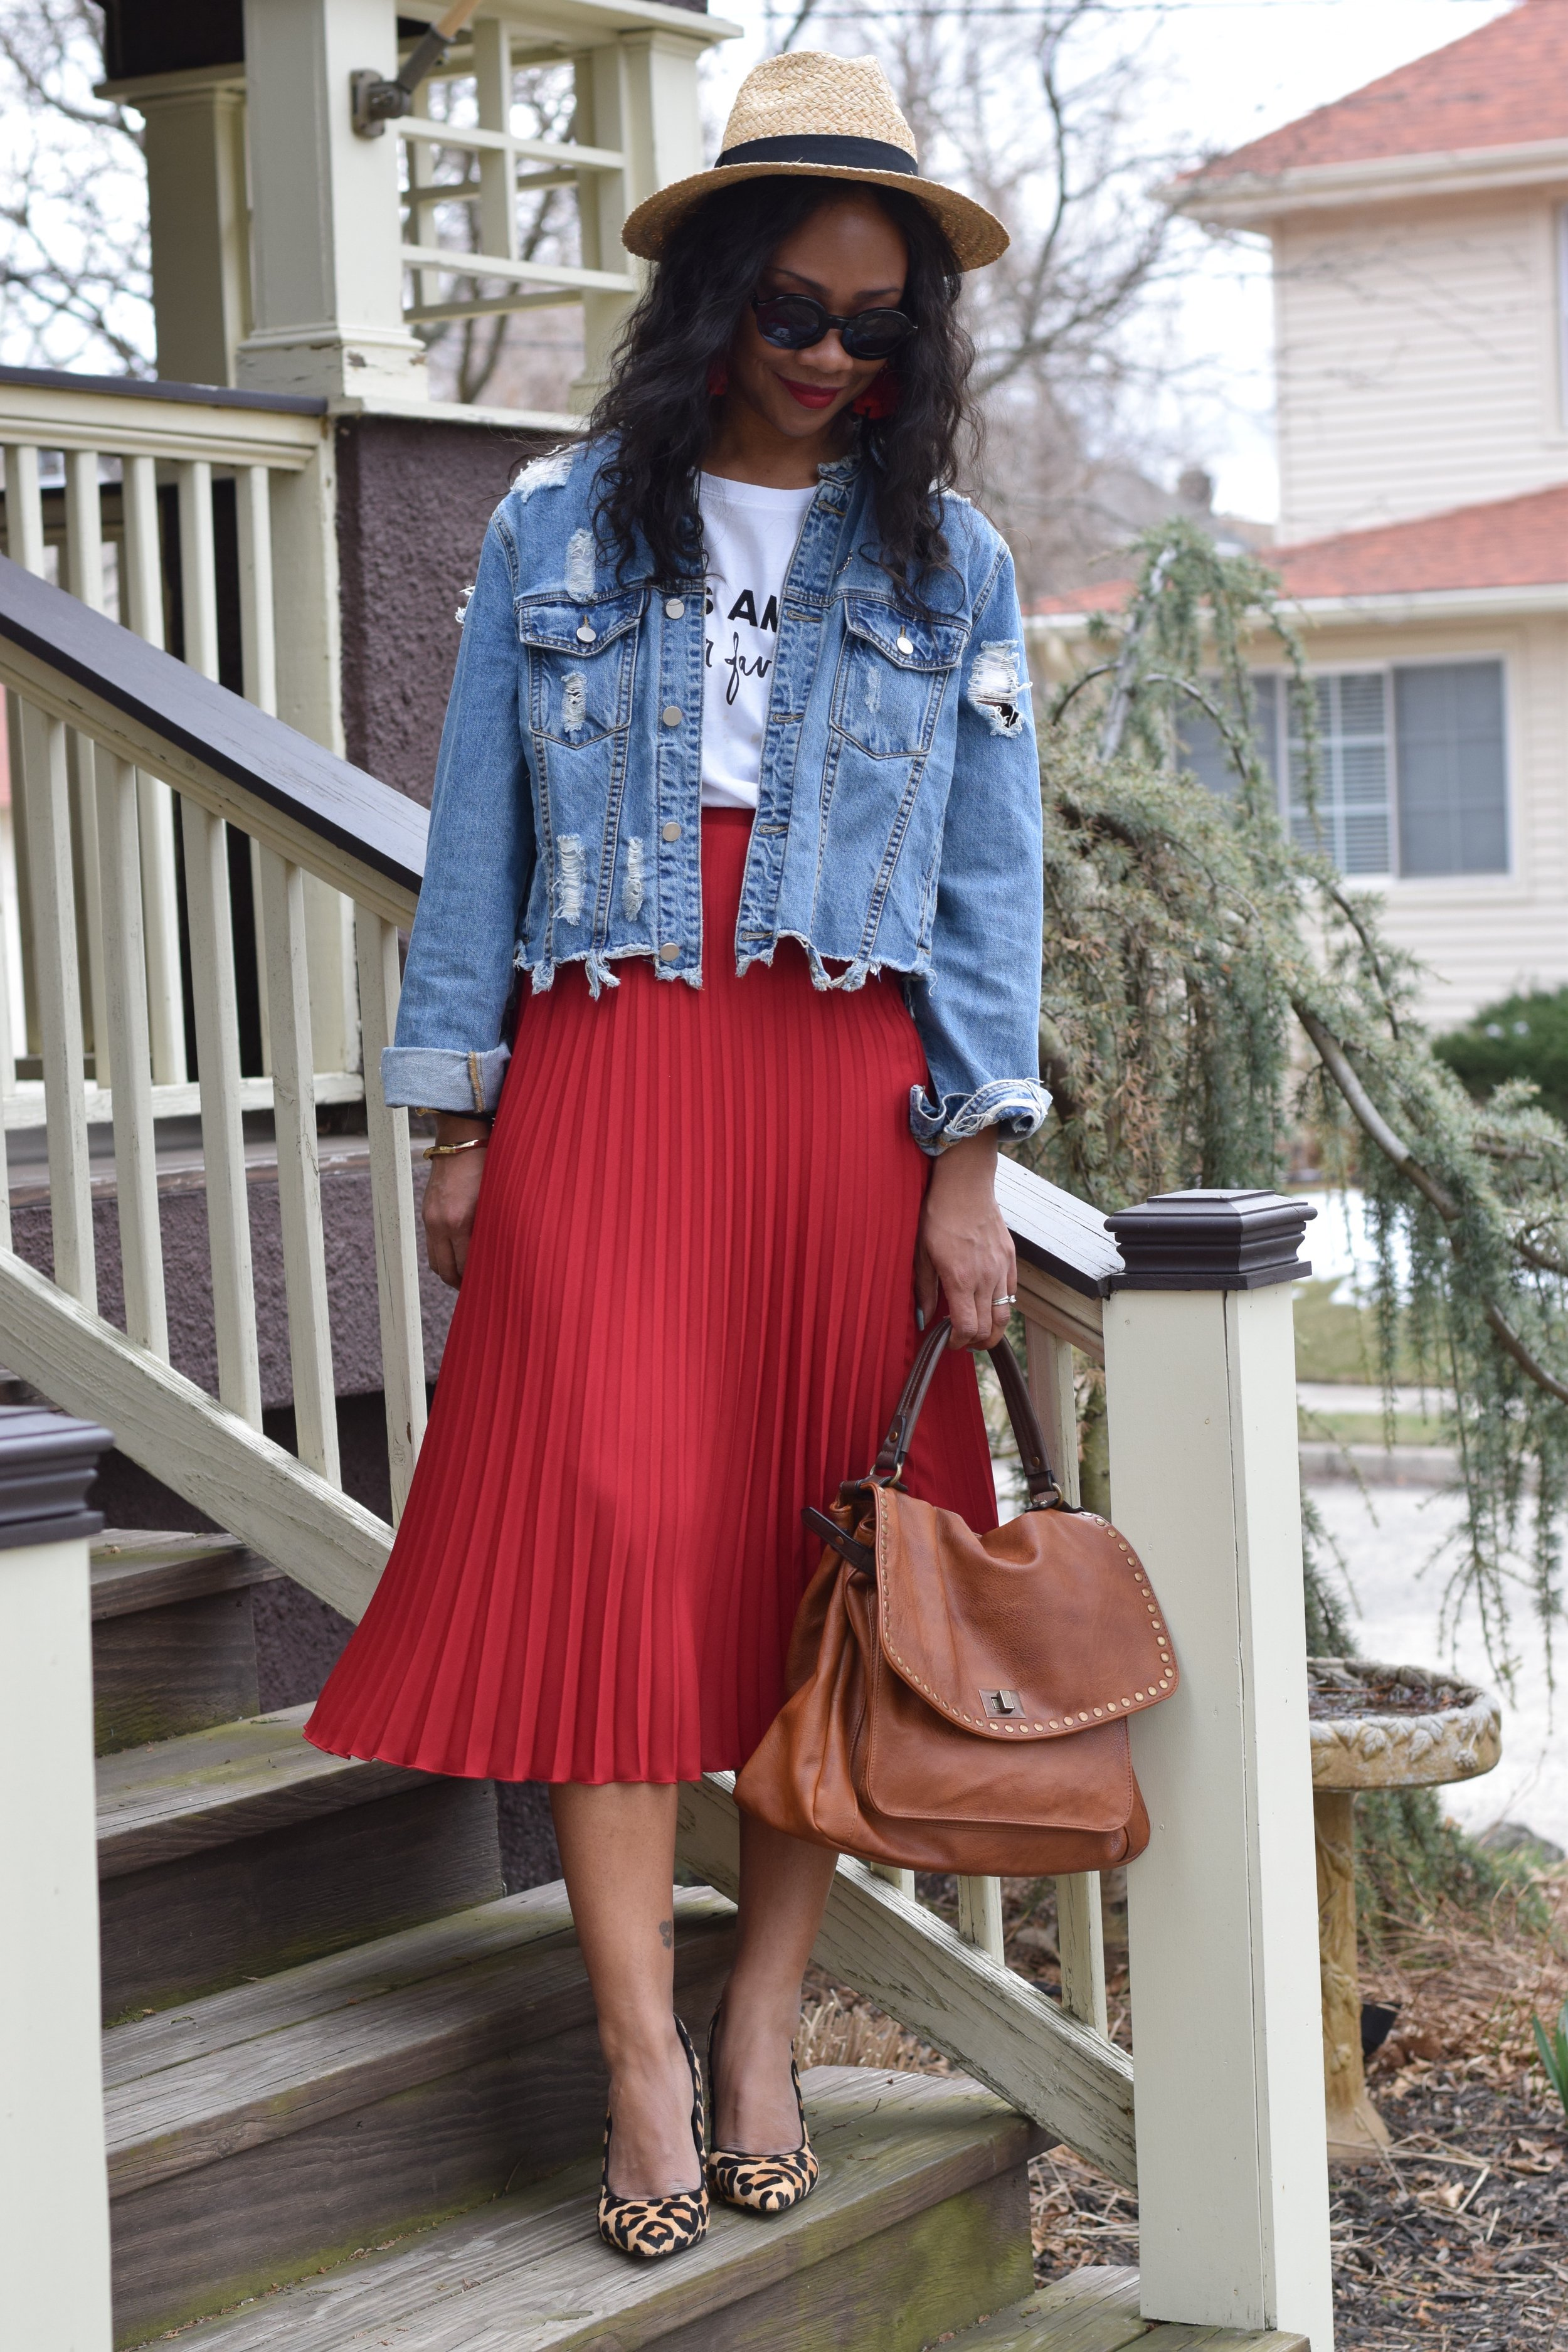 Shoes - ASOS (@ASOS); skirt - H&M (@hm); bag -Vici Collection (@vicidolls); shirt & hat - Target (@targetstyle)